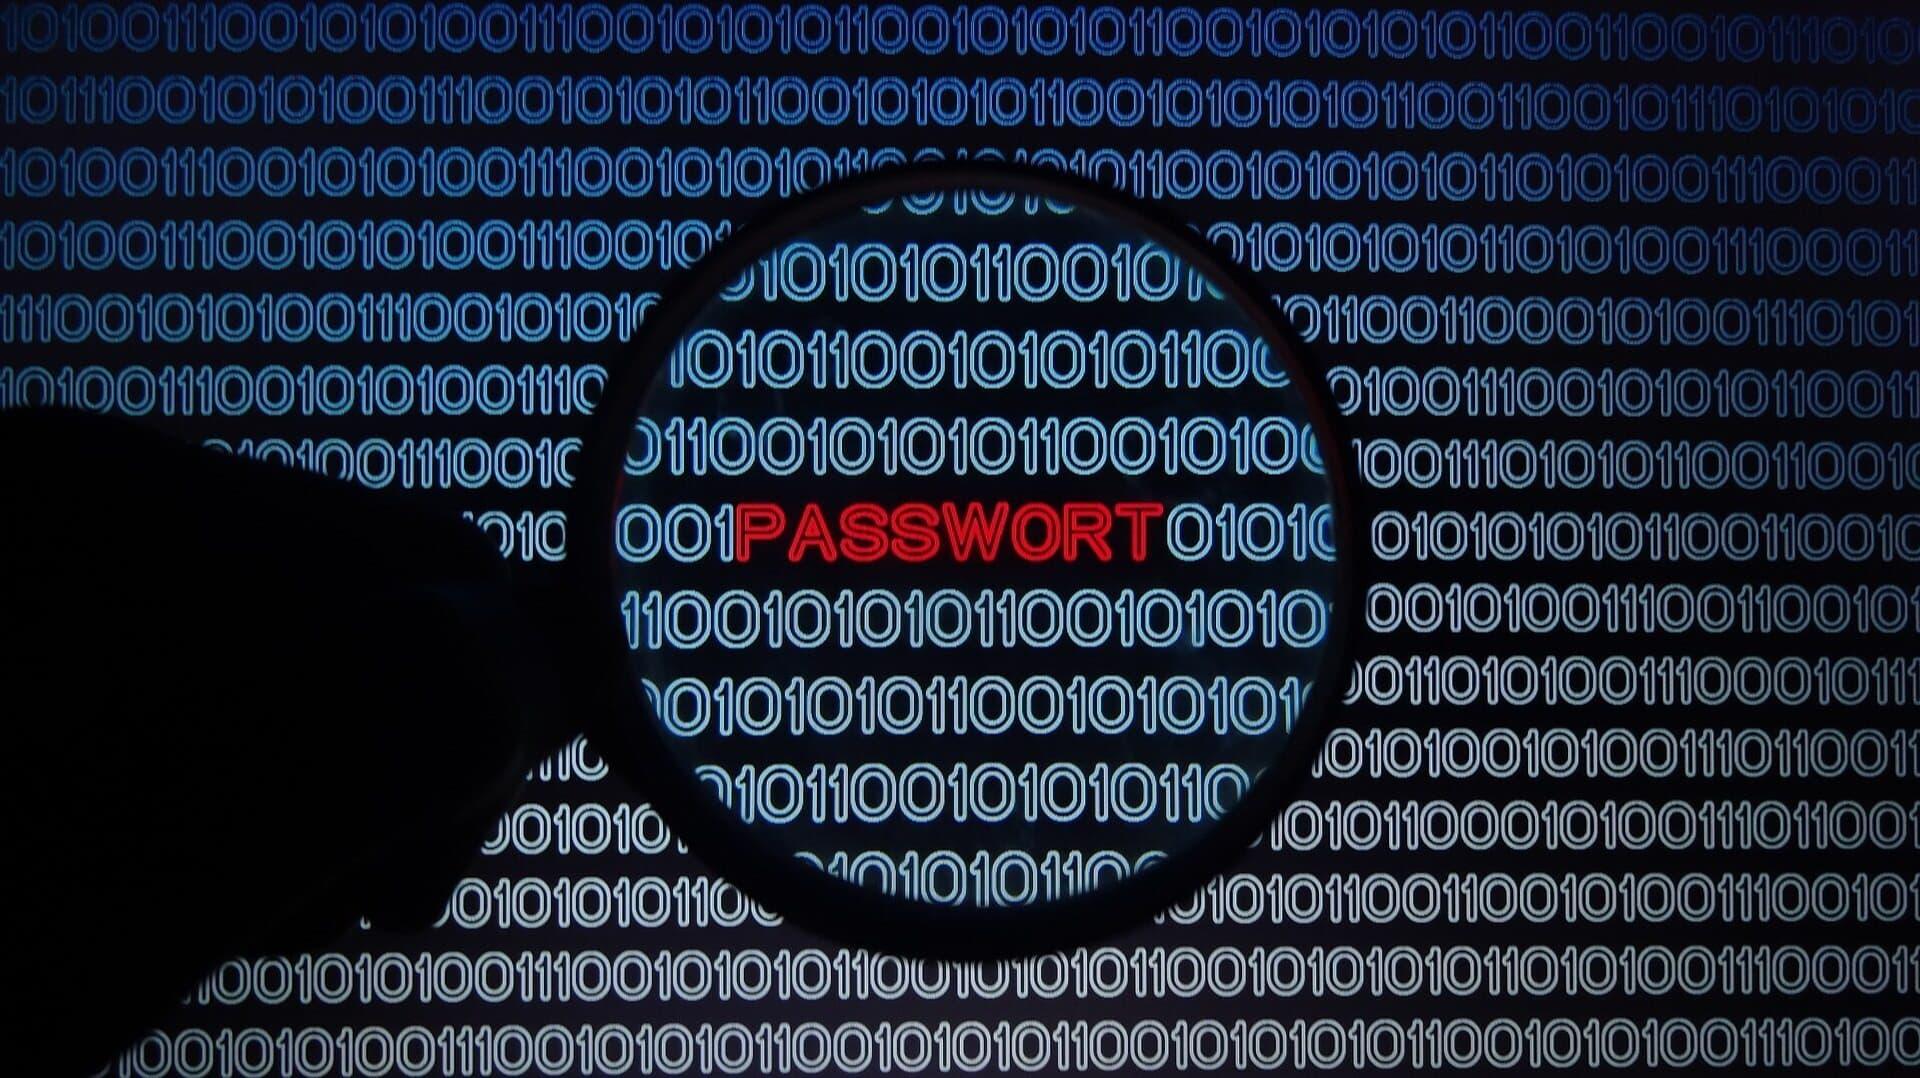 Passwort, Hacker, Datenschutz, Cyberkriminalität